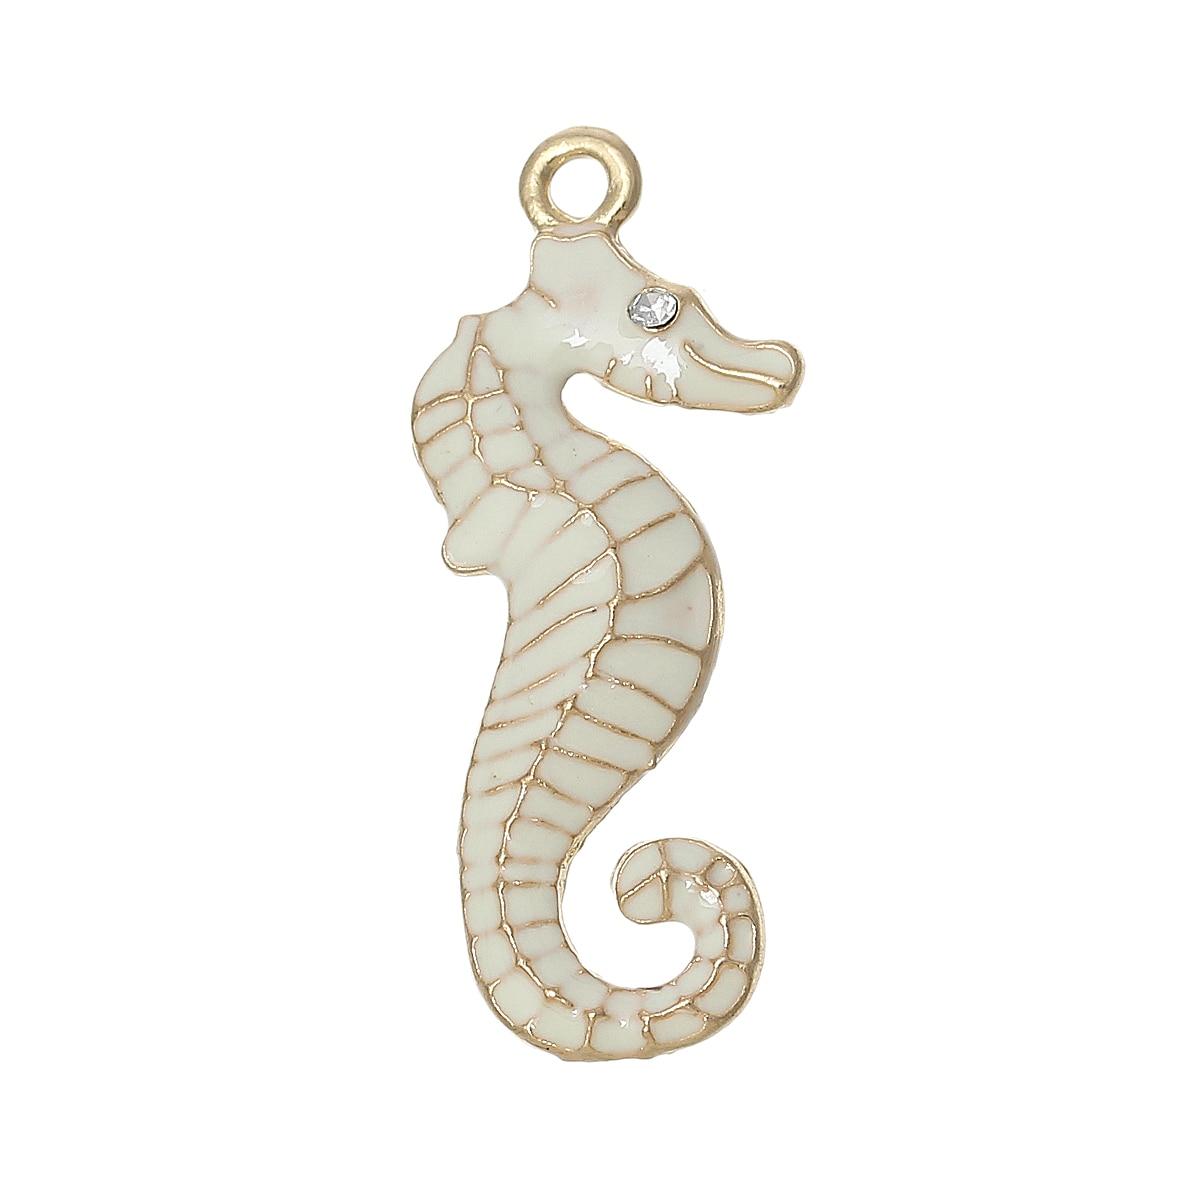 "8SEASONS Charm Pendants Seahorse Gold color Clear Rhinestone White Enamel 31mm(1 2/8"") x 13mm( 4/8""),5 Pcs"